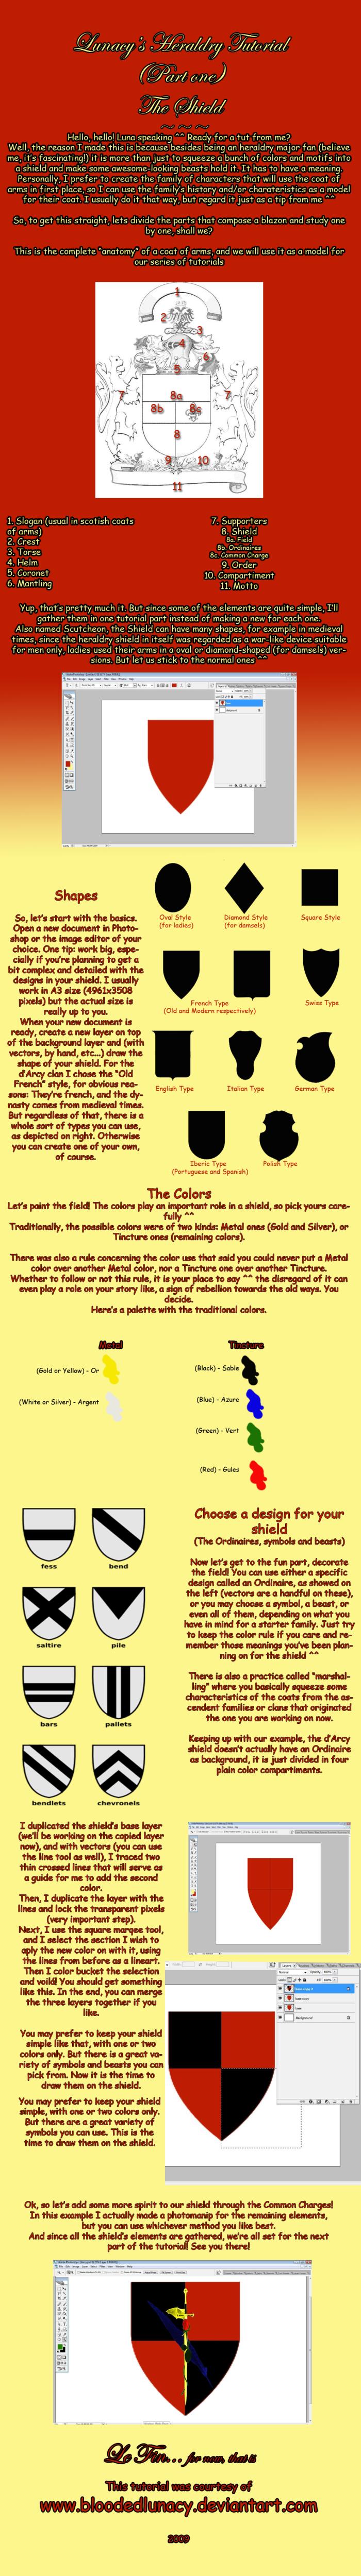 Tutorial on Heraldry - Part 1 by BloodedLunacy